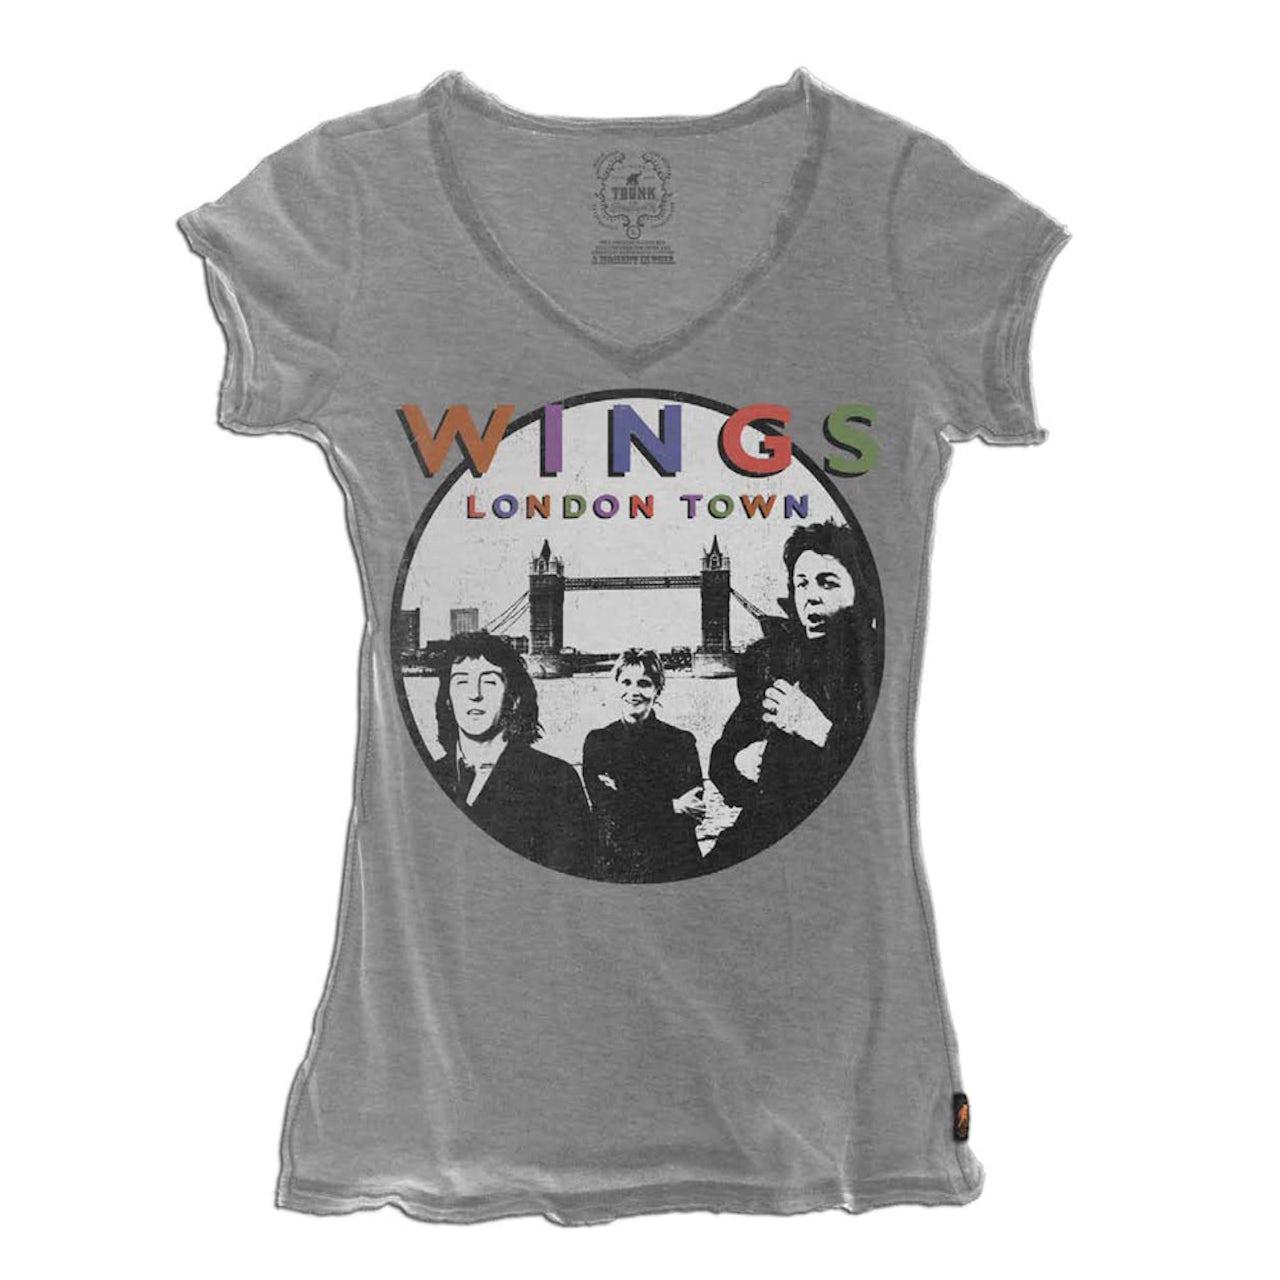 Paul McCartney Trunk Wings London Town V-Neck Tee